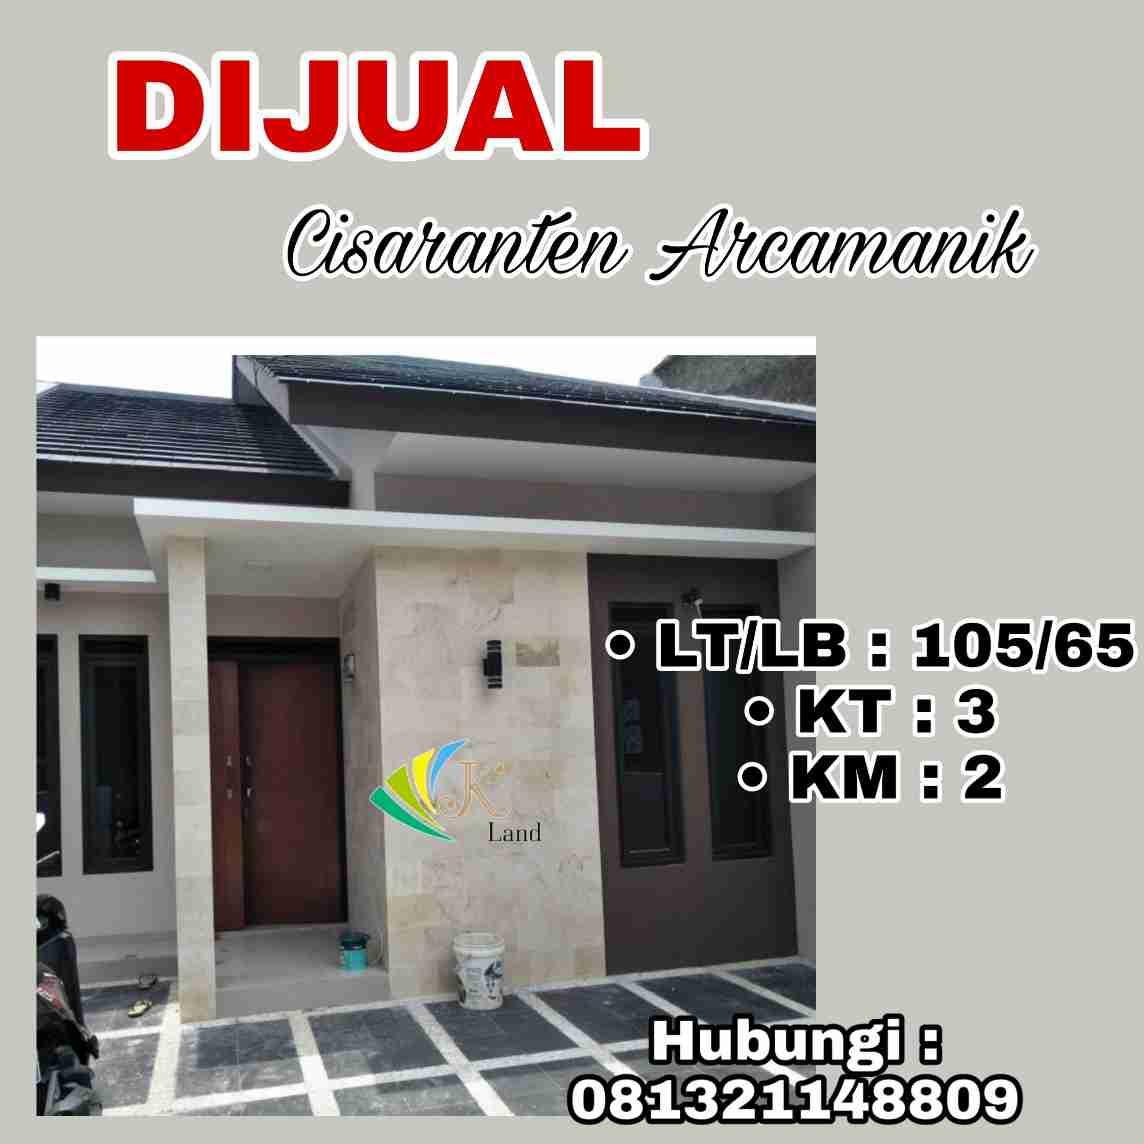 Dijual Rumah Cisaranten Arcamanik Bandung Nyaman dan Modern